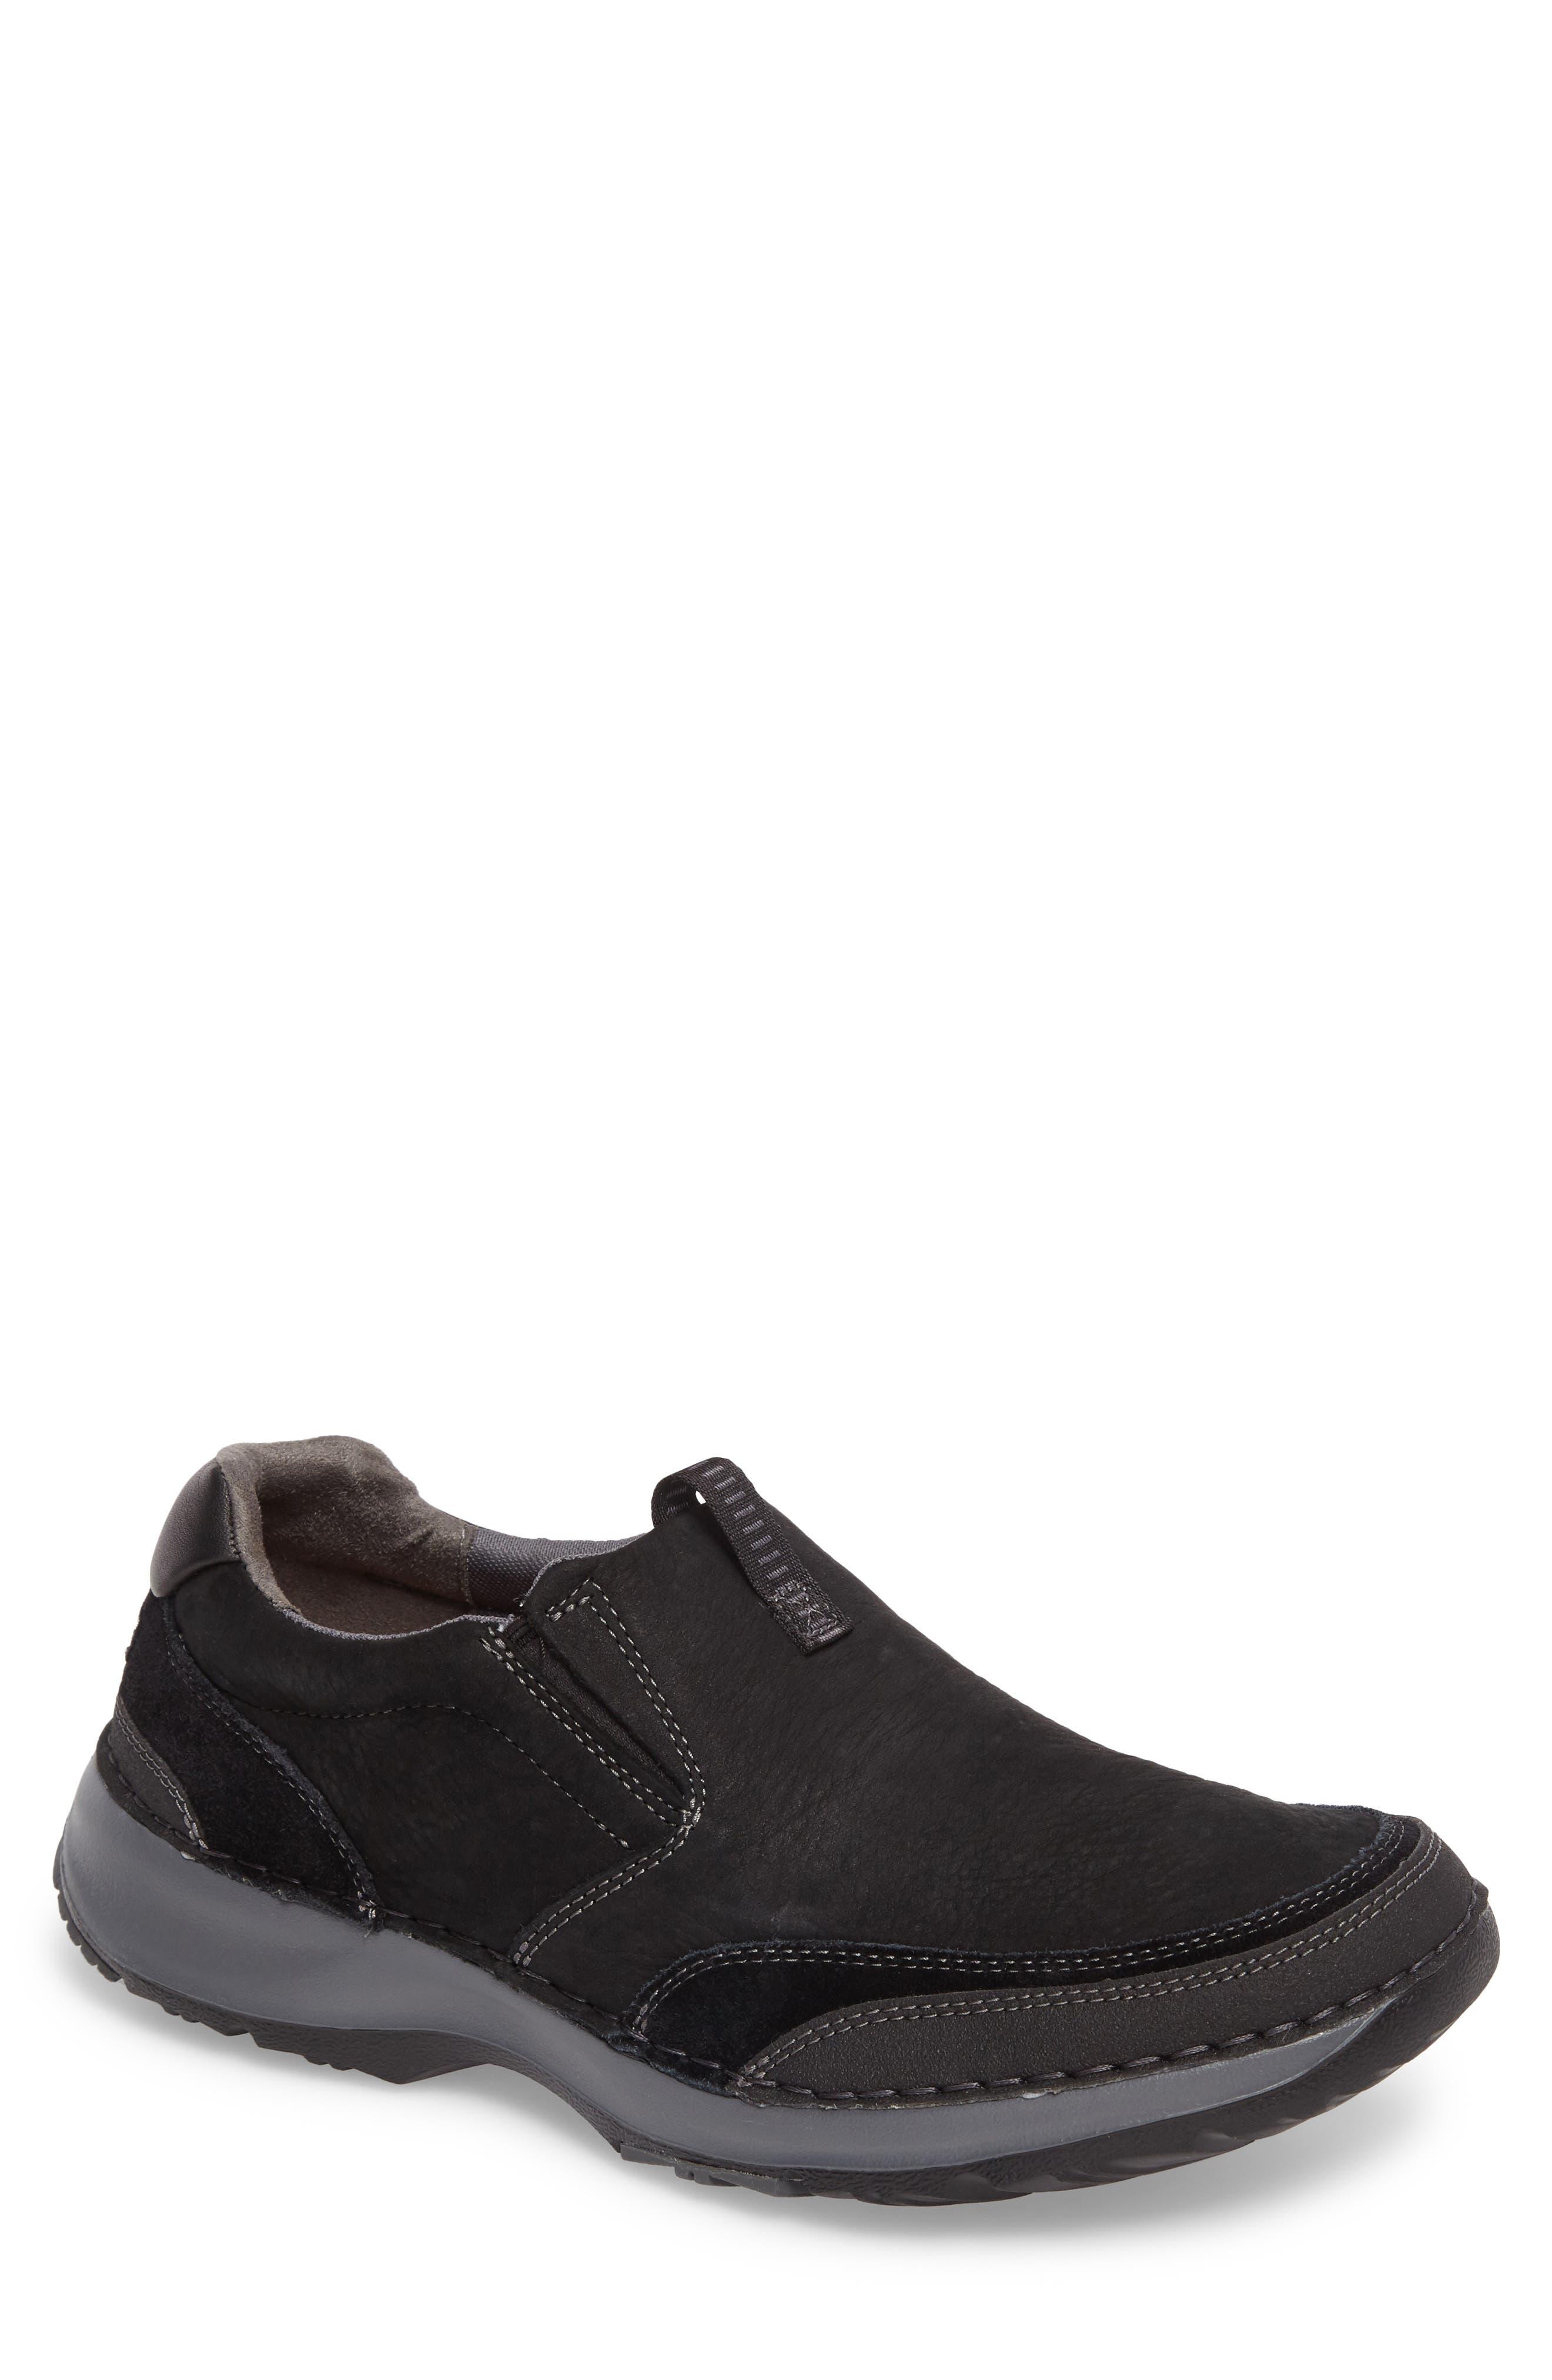 Lite Five Slip-On,                         Main,                         color, BLACK LEATHER